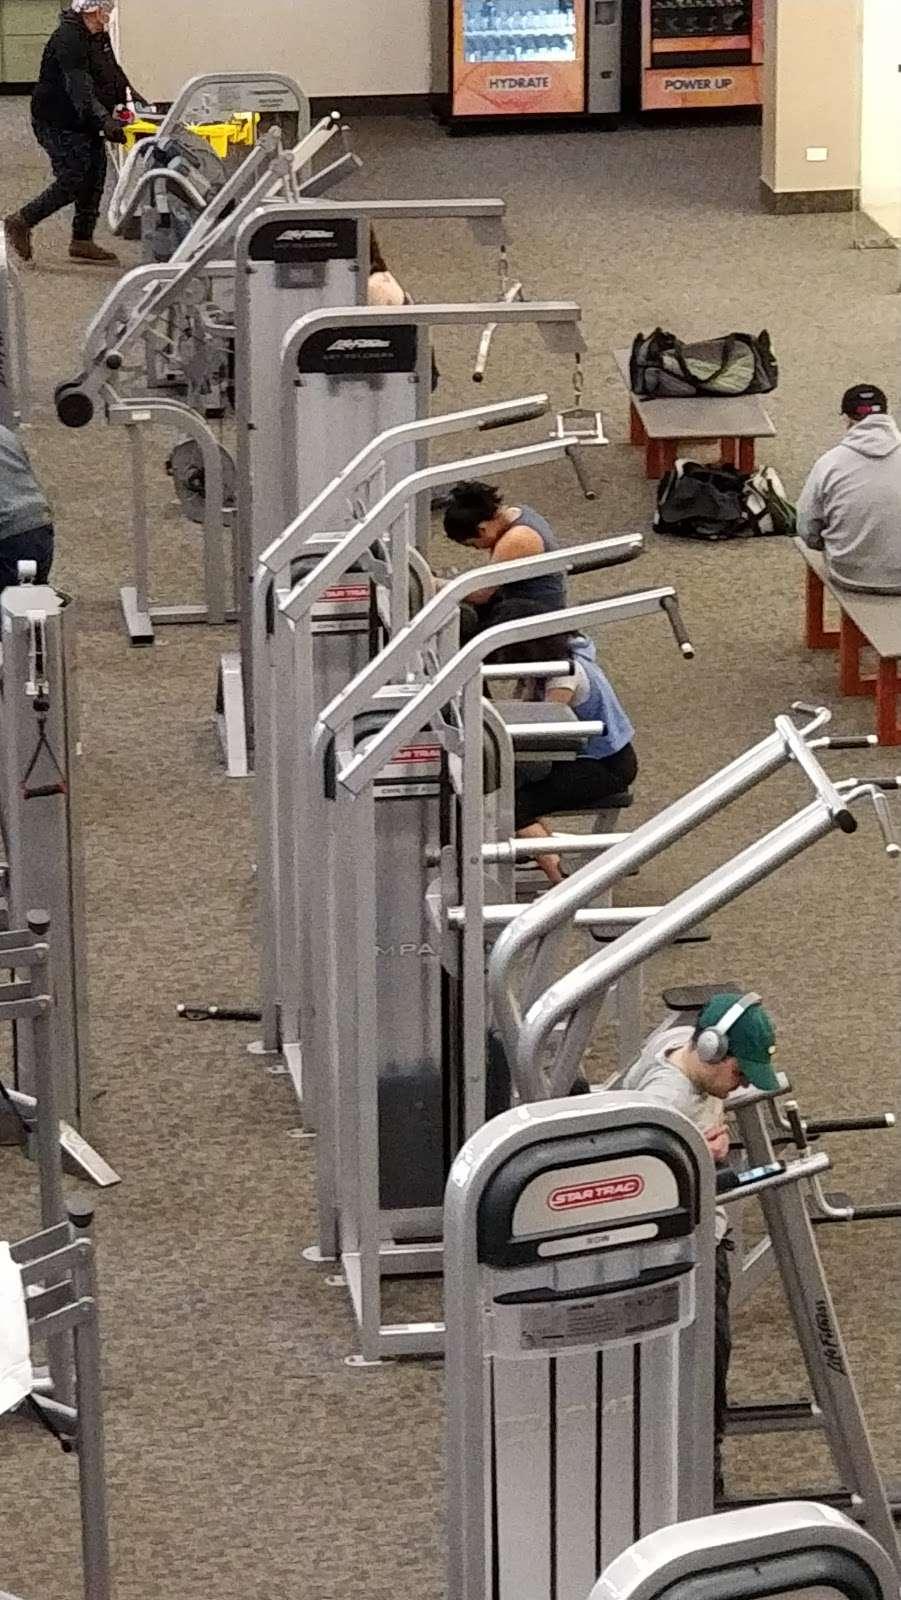 LA Fitness - gym  | Photo 3 of 10 | Address: 452 Lakehurst Rd, Waukegan, IL 60085, USA | Phone: (224) 399-0990